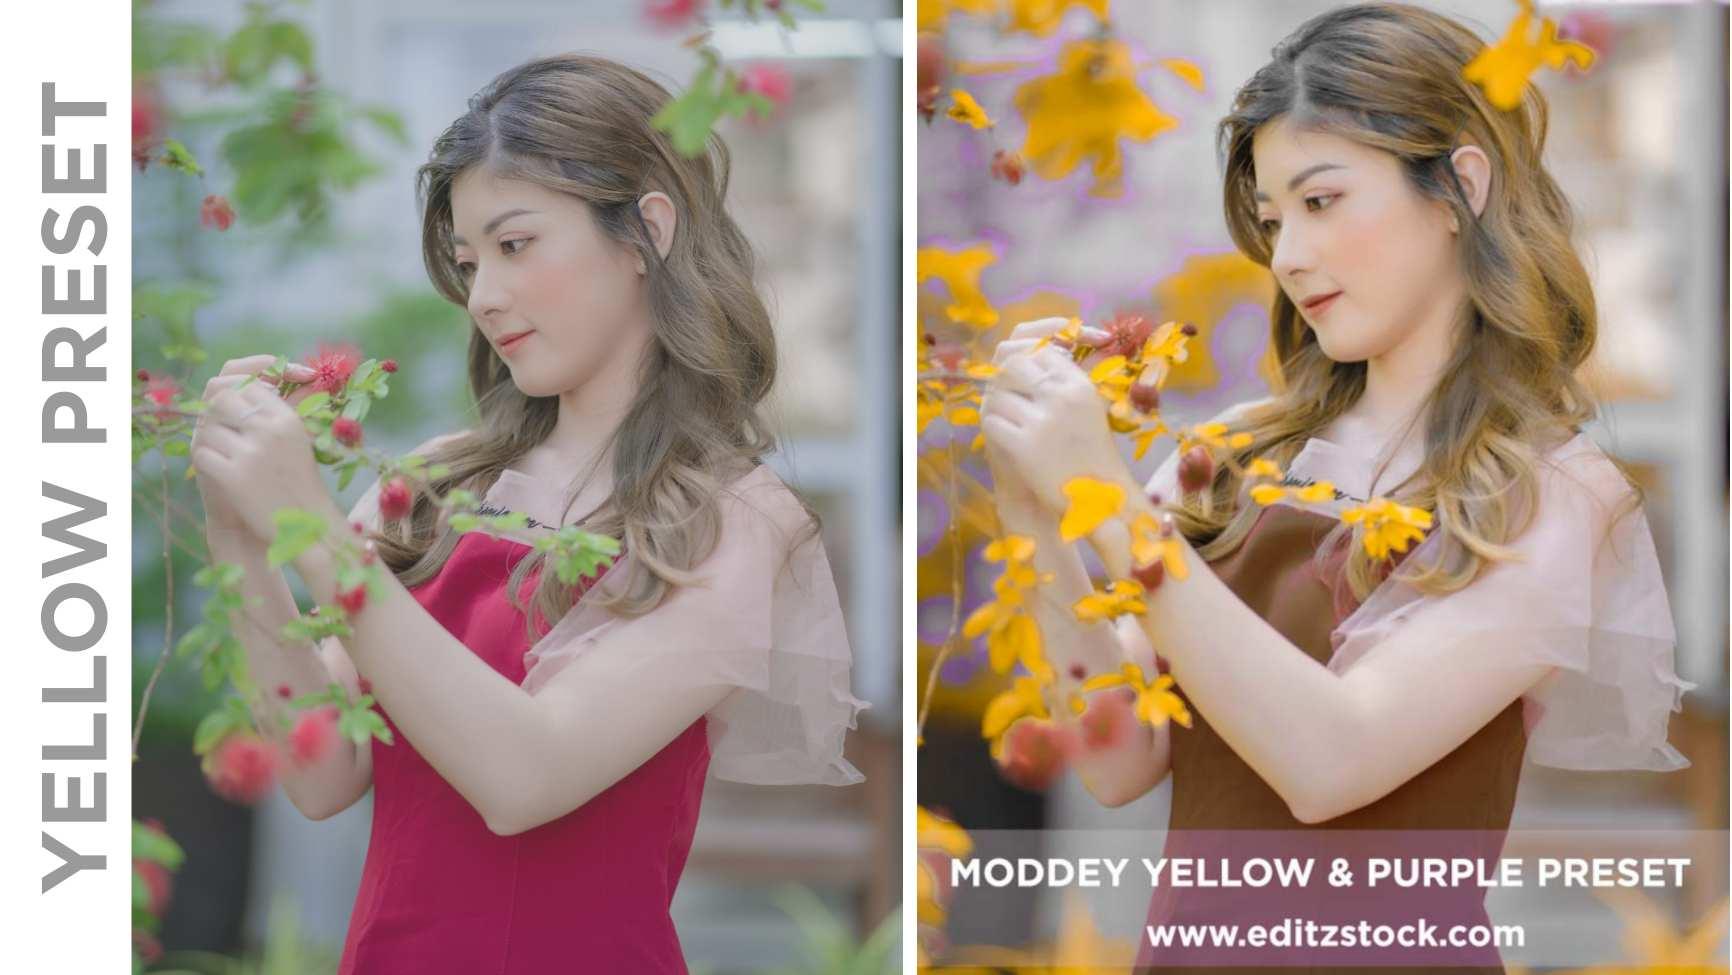 Yellow and purple preset